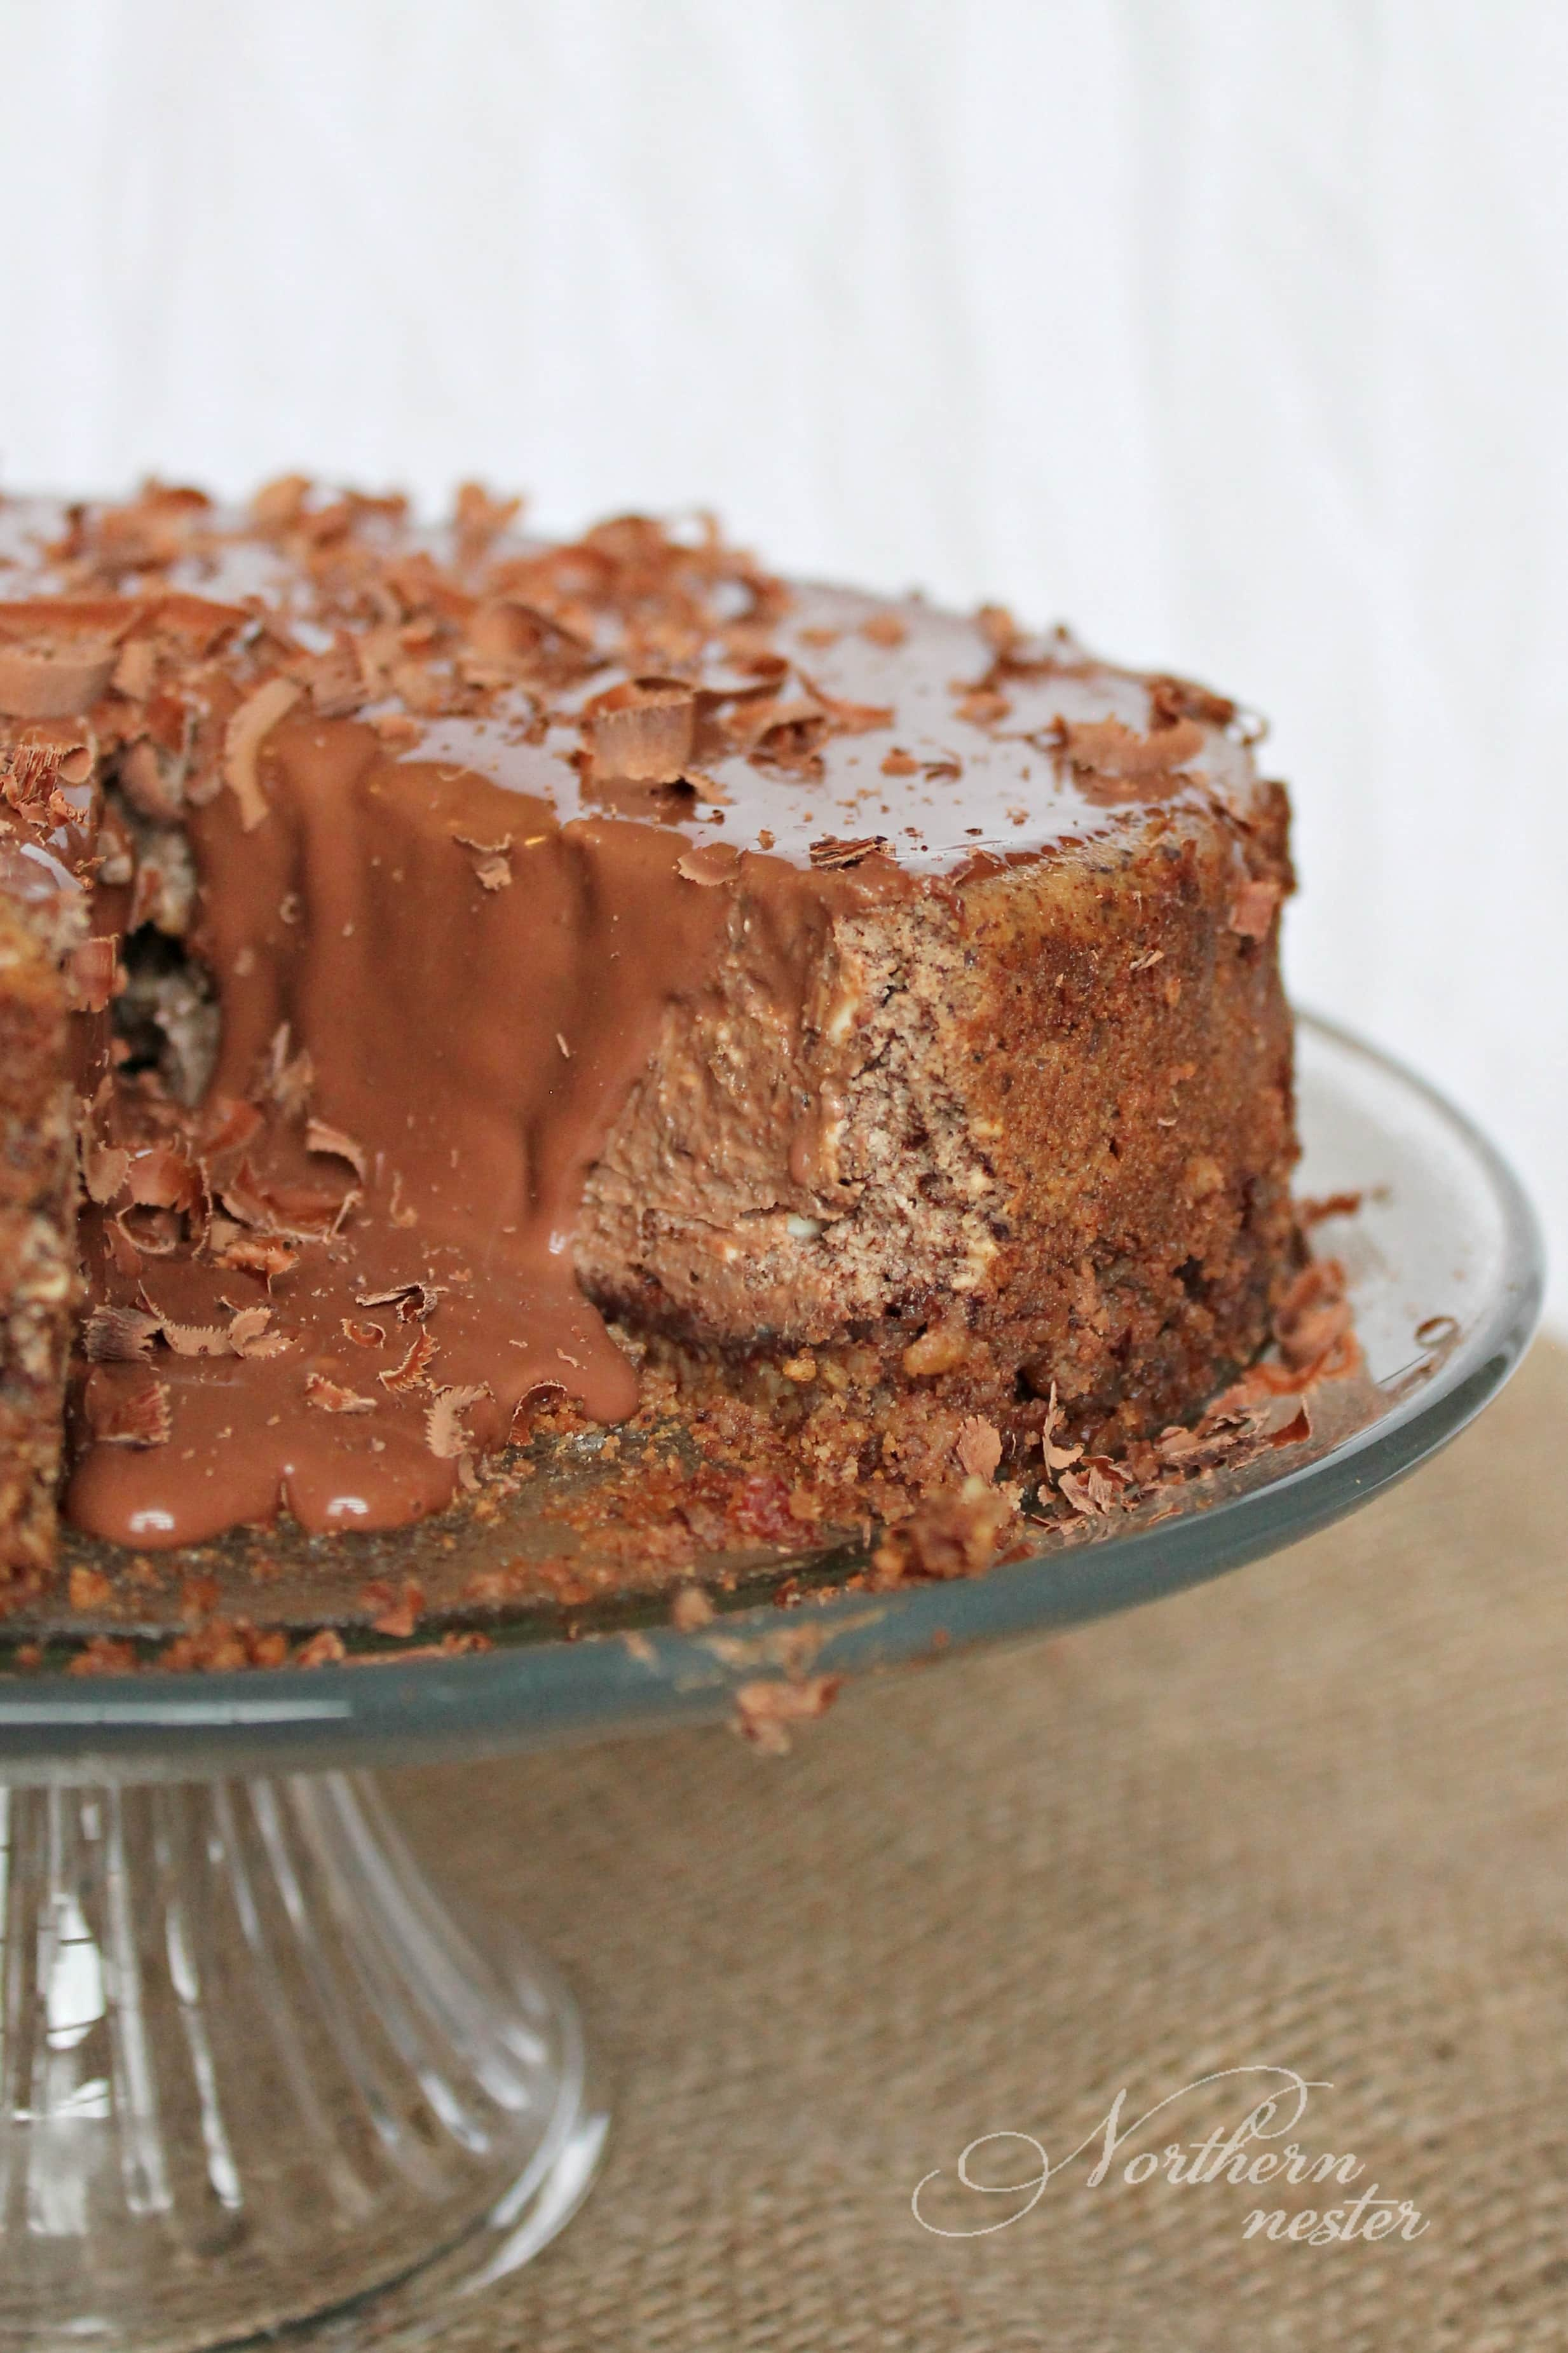 Chocolate Cappuccino Cheesecake | THM: S - Northern Nester